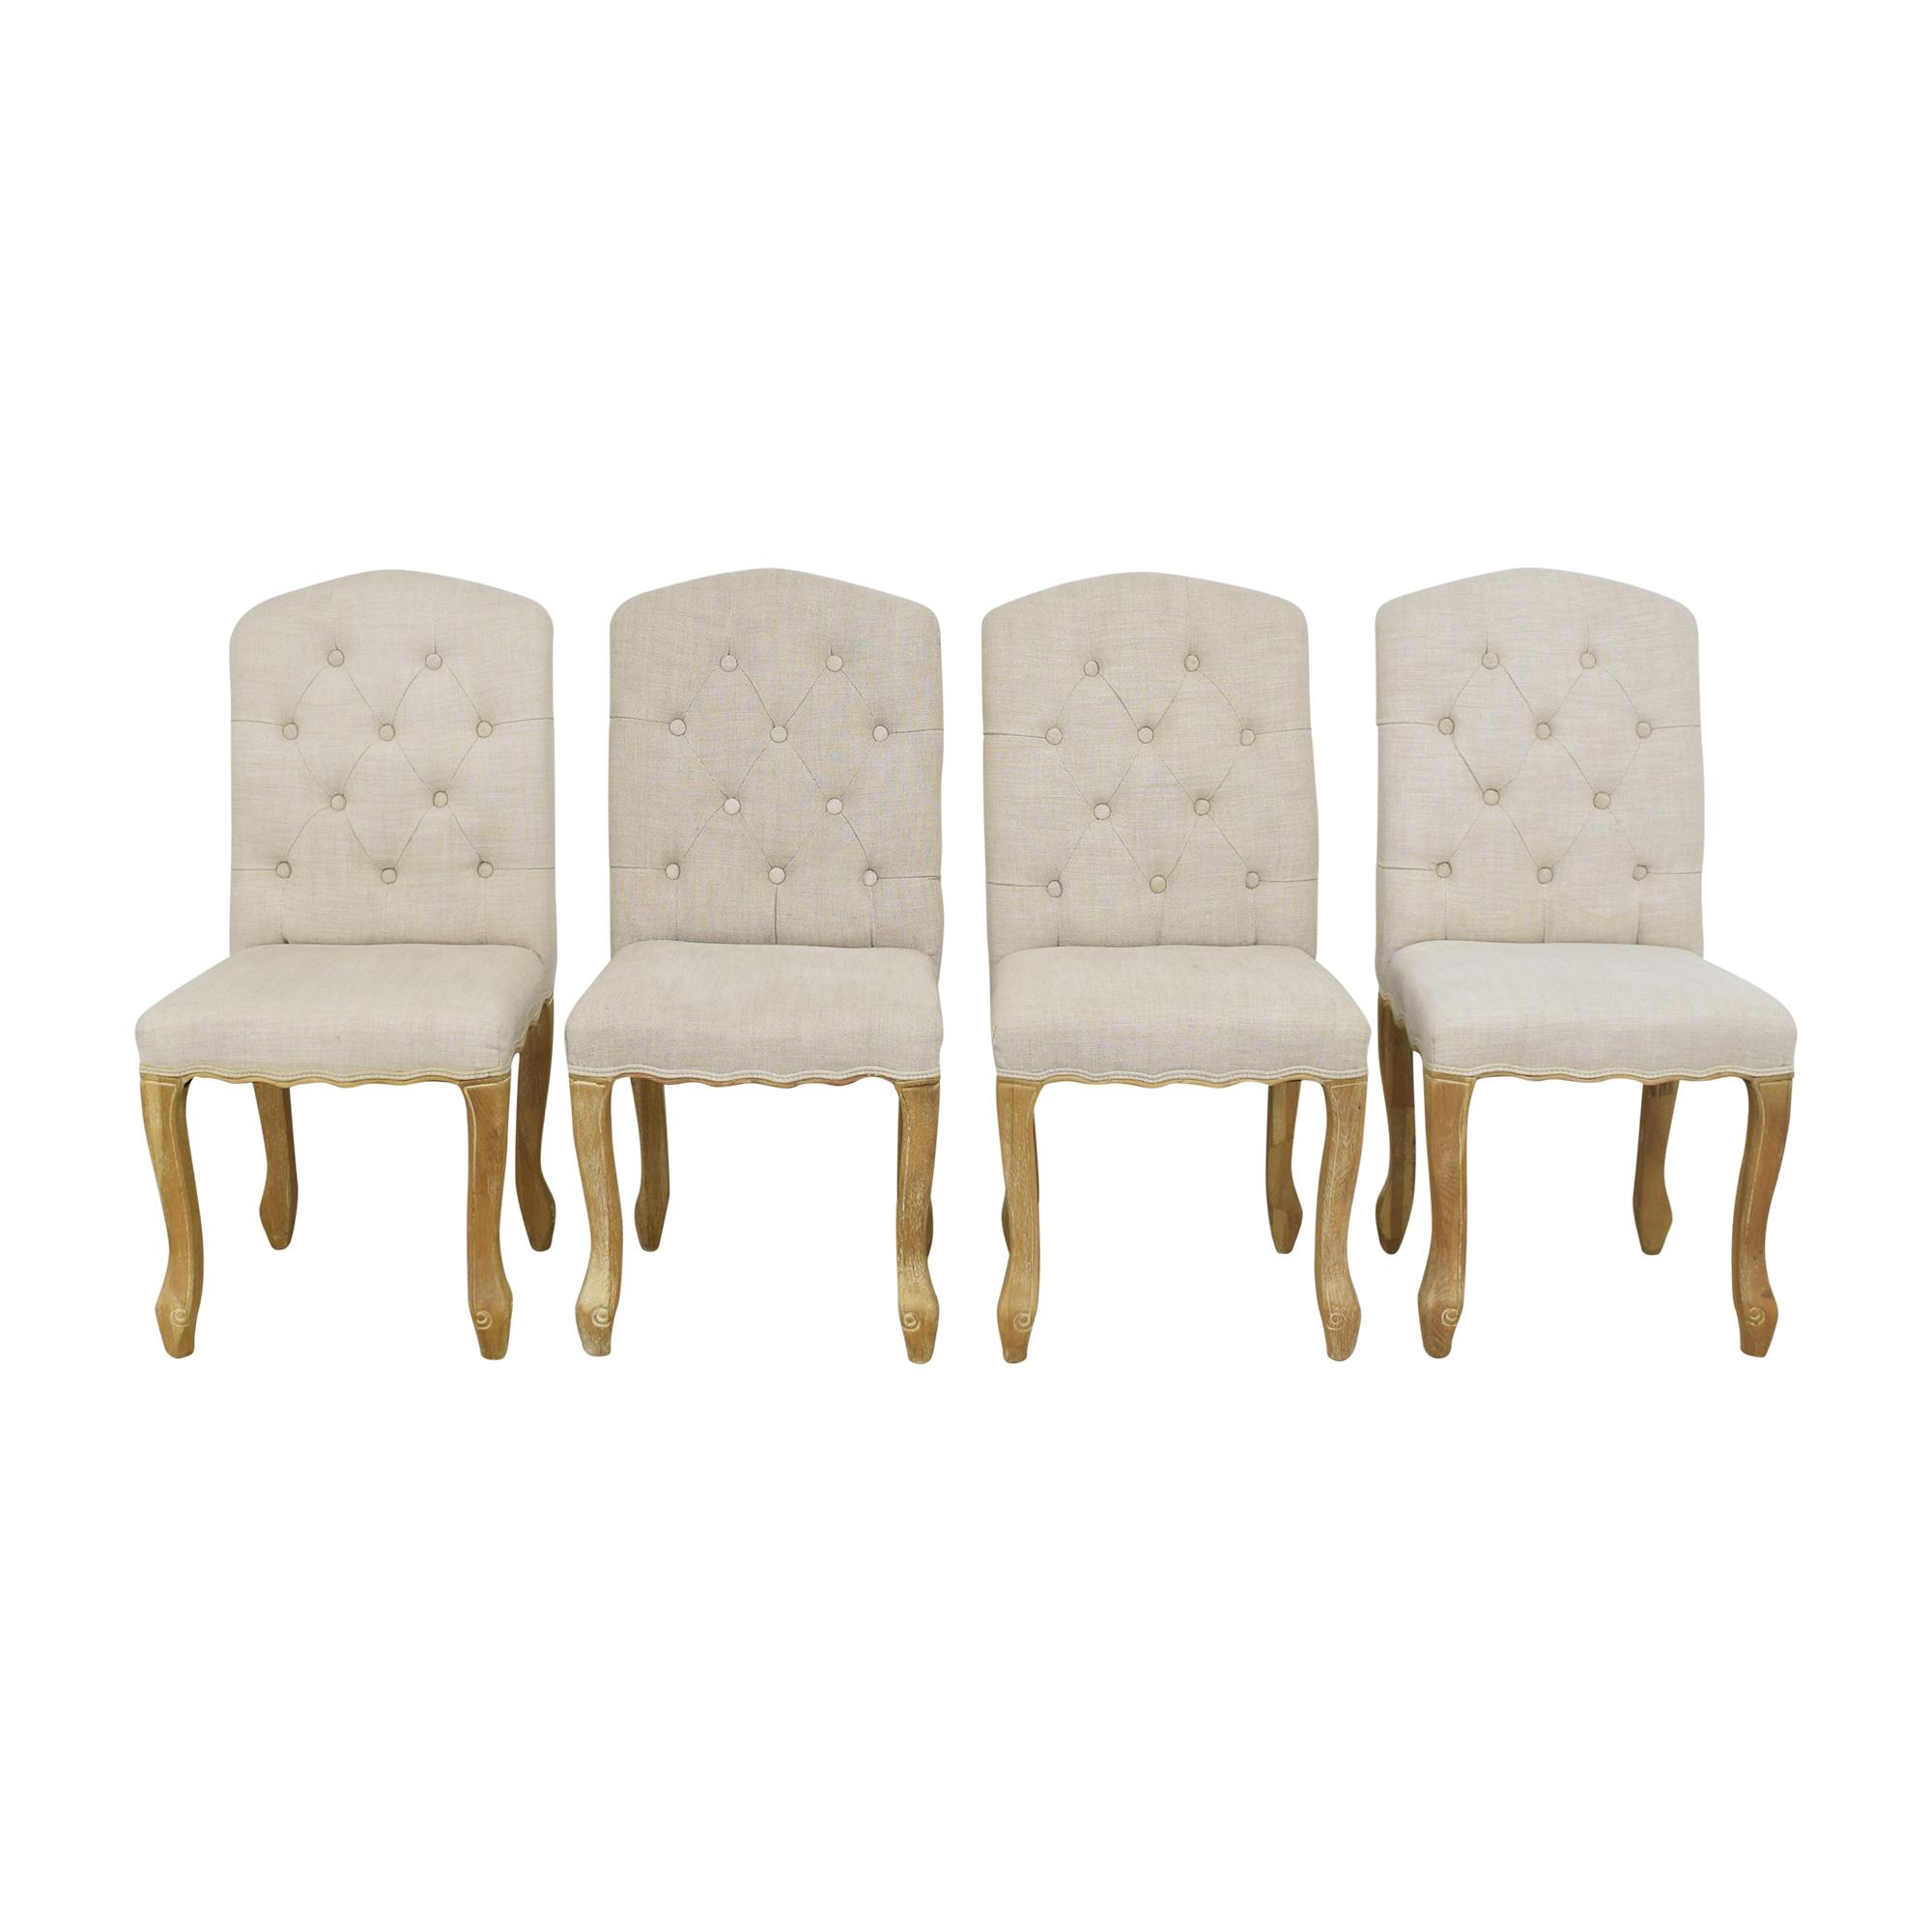 Zuo Modern Zuo Modern Noe Valley Chairs ma